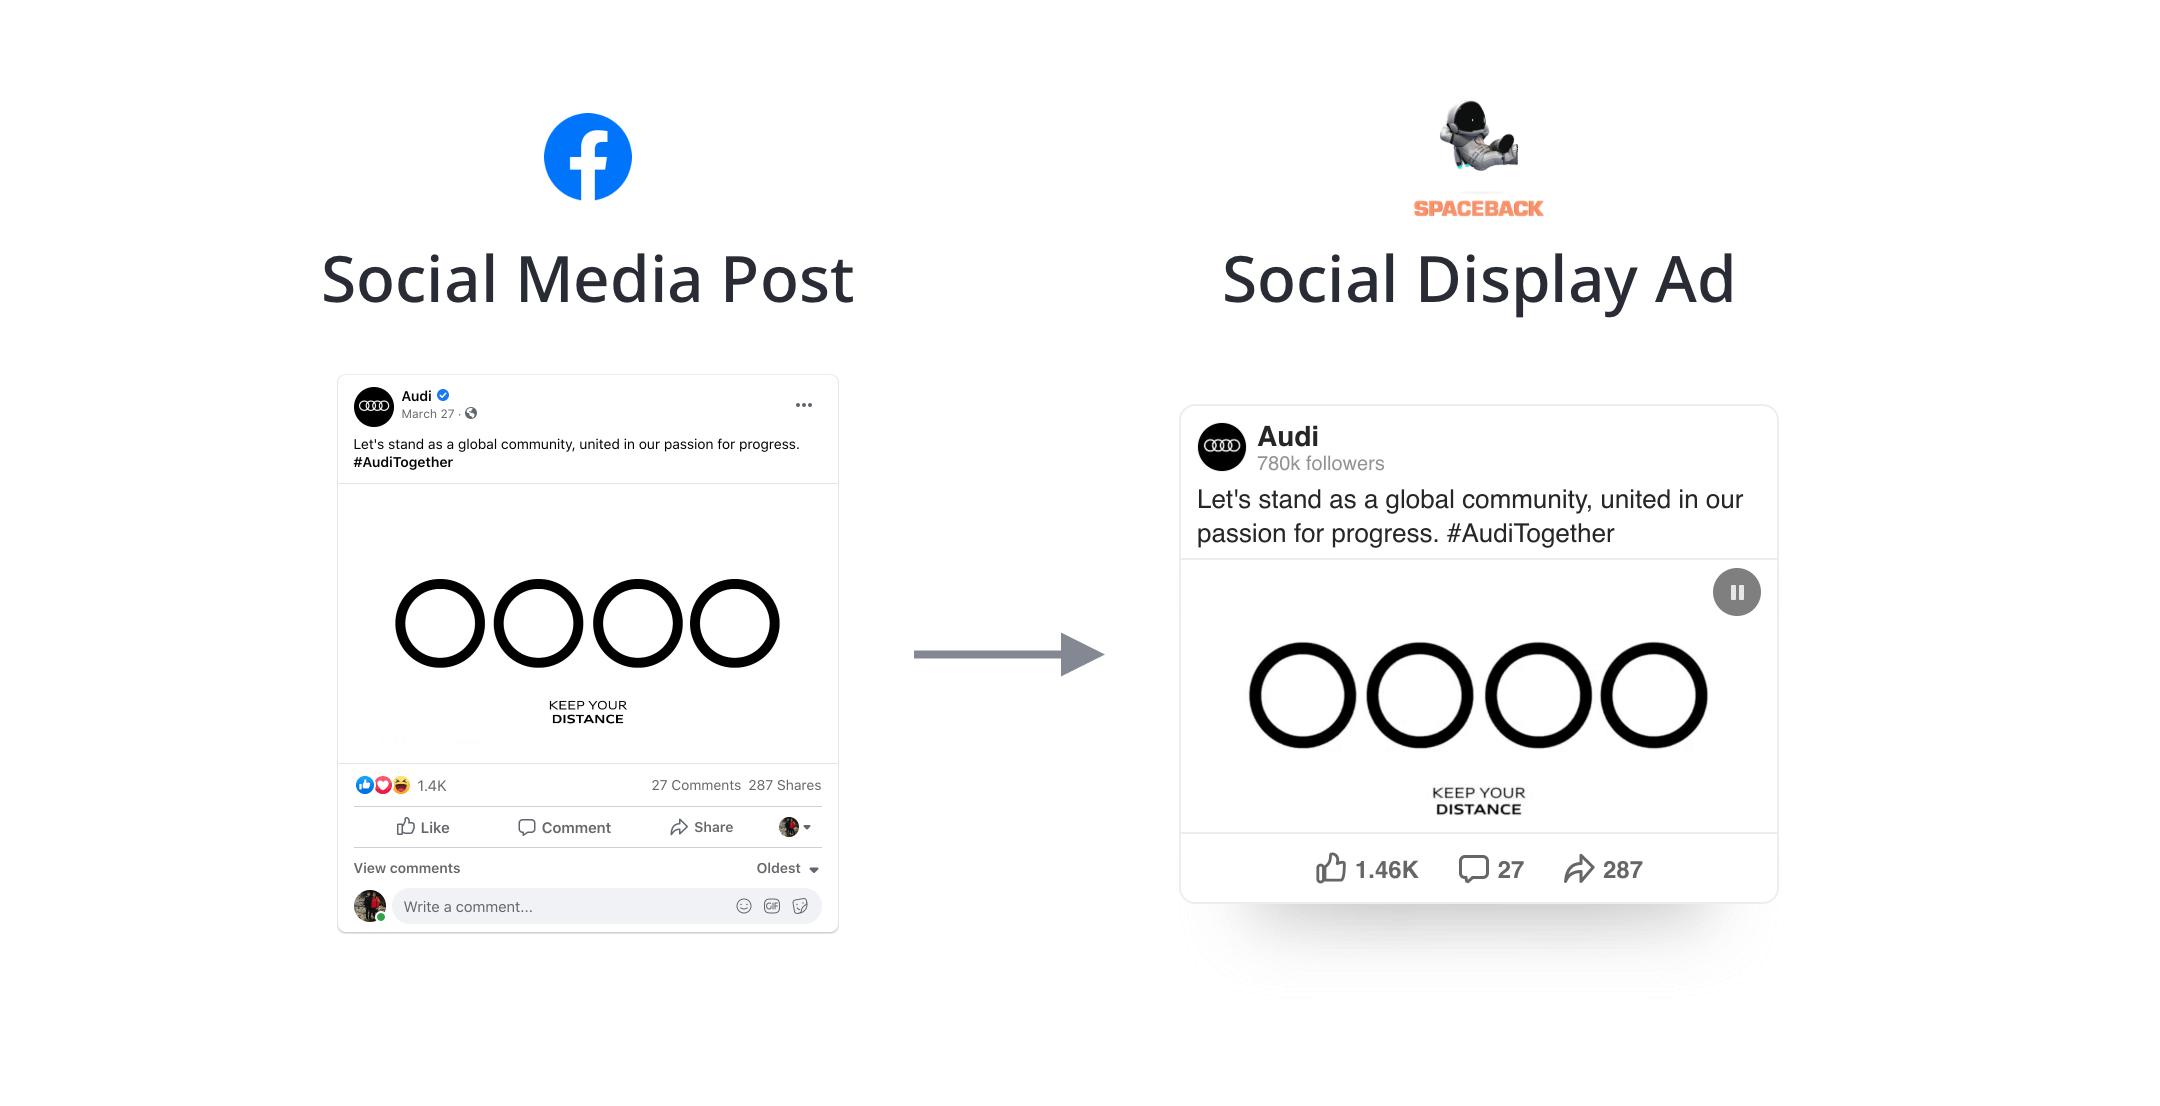 Audi Facebook Spaceback Social Display Ad